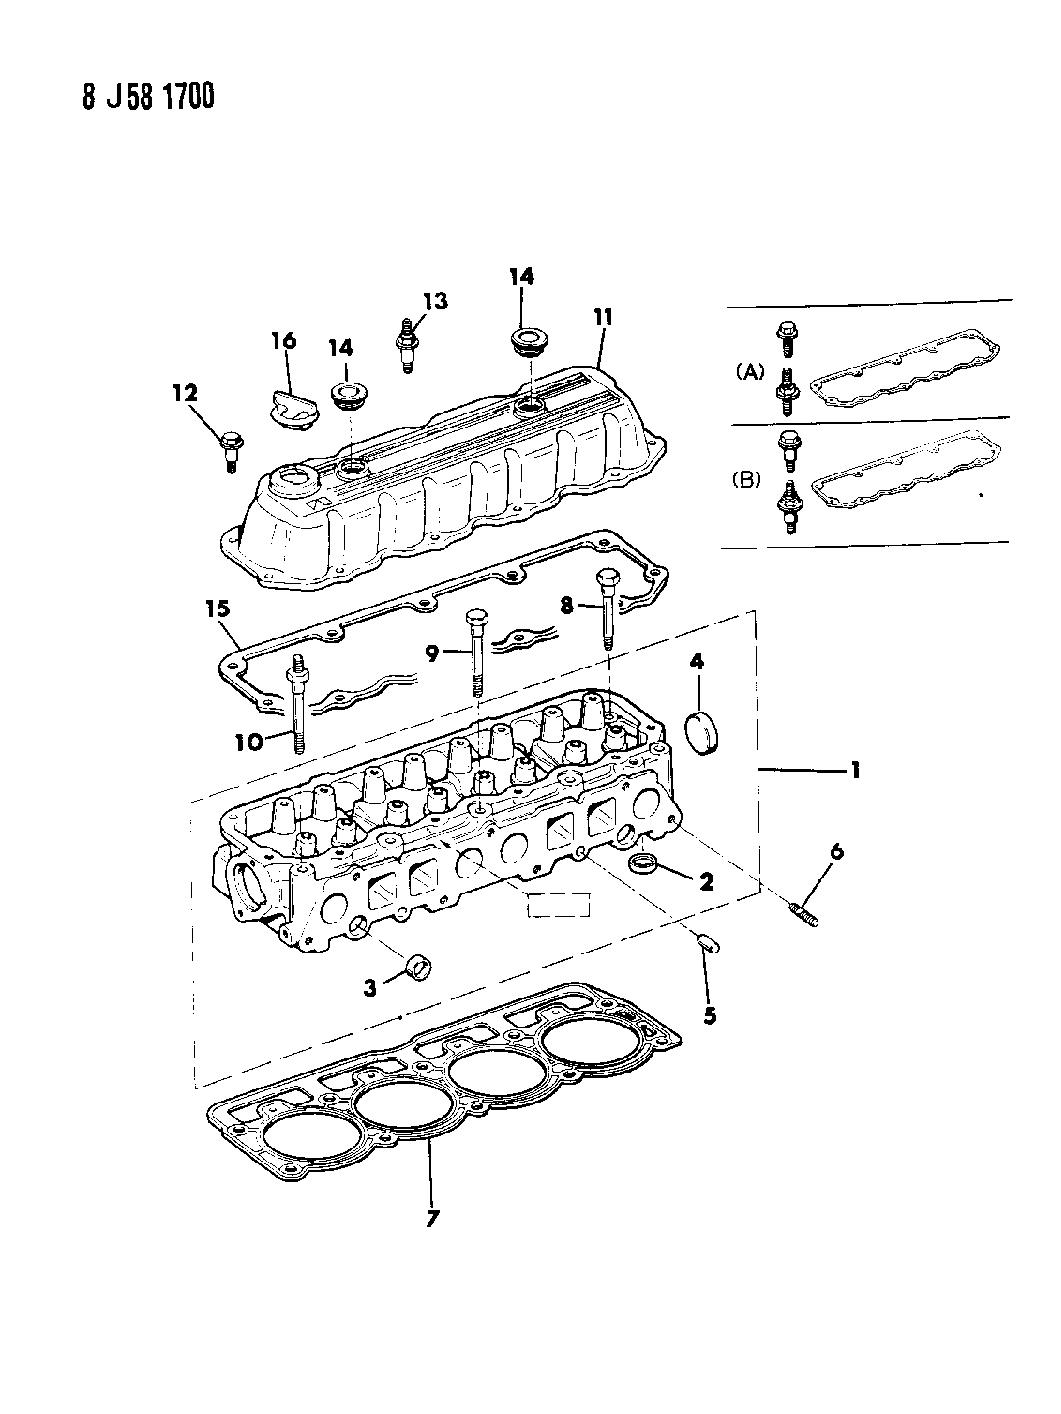 1987 Jeep Comanche Cylinder Head Gasket